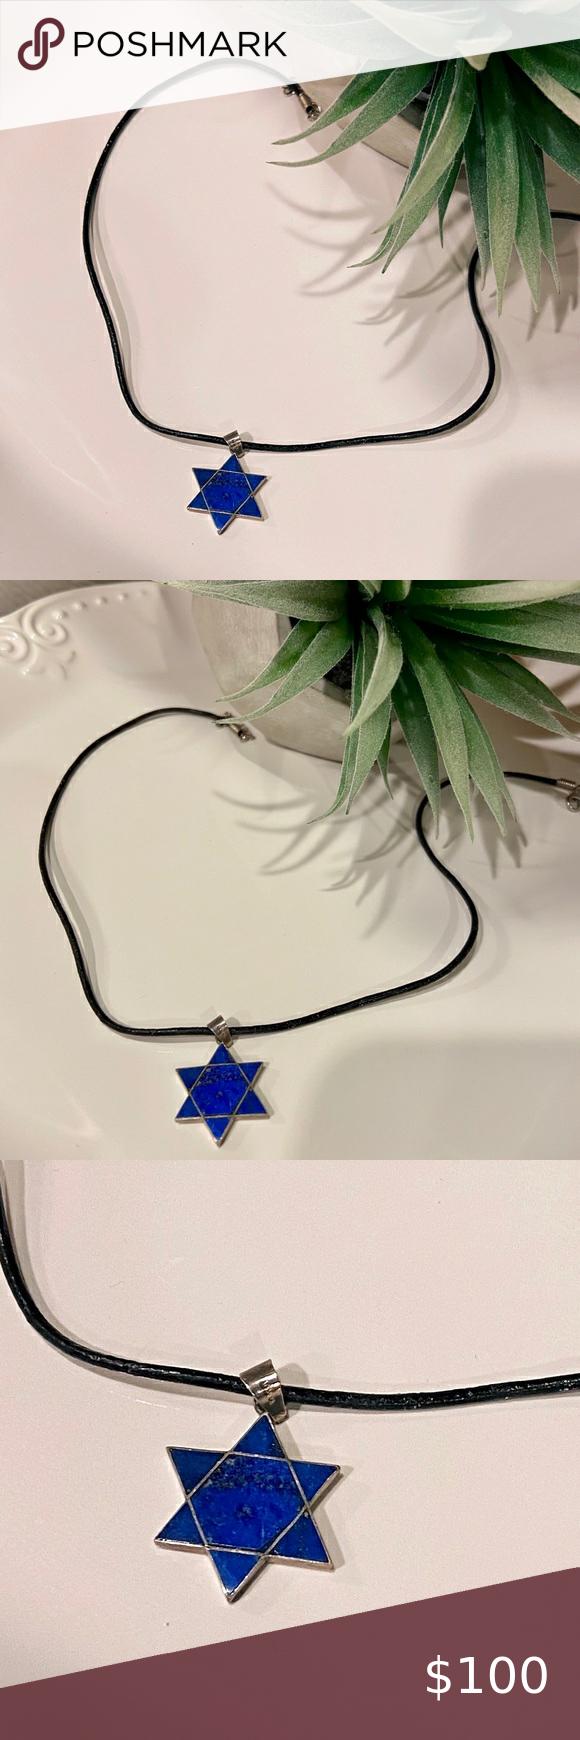 Jewish Star Lapis Lazuli Necklace Pendant In 2020 Lapis Lazuli Necklace Jewish Star Mens Accessories Jewelry